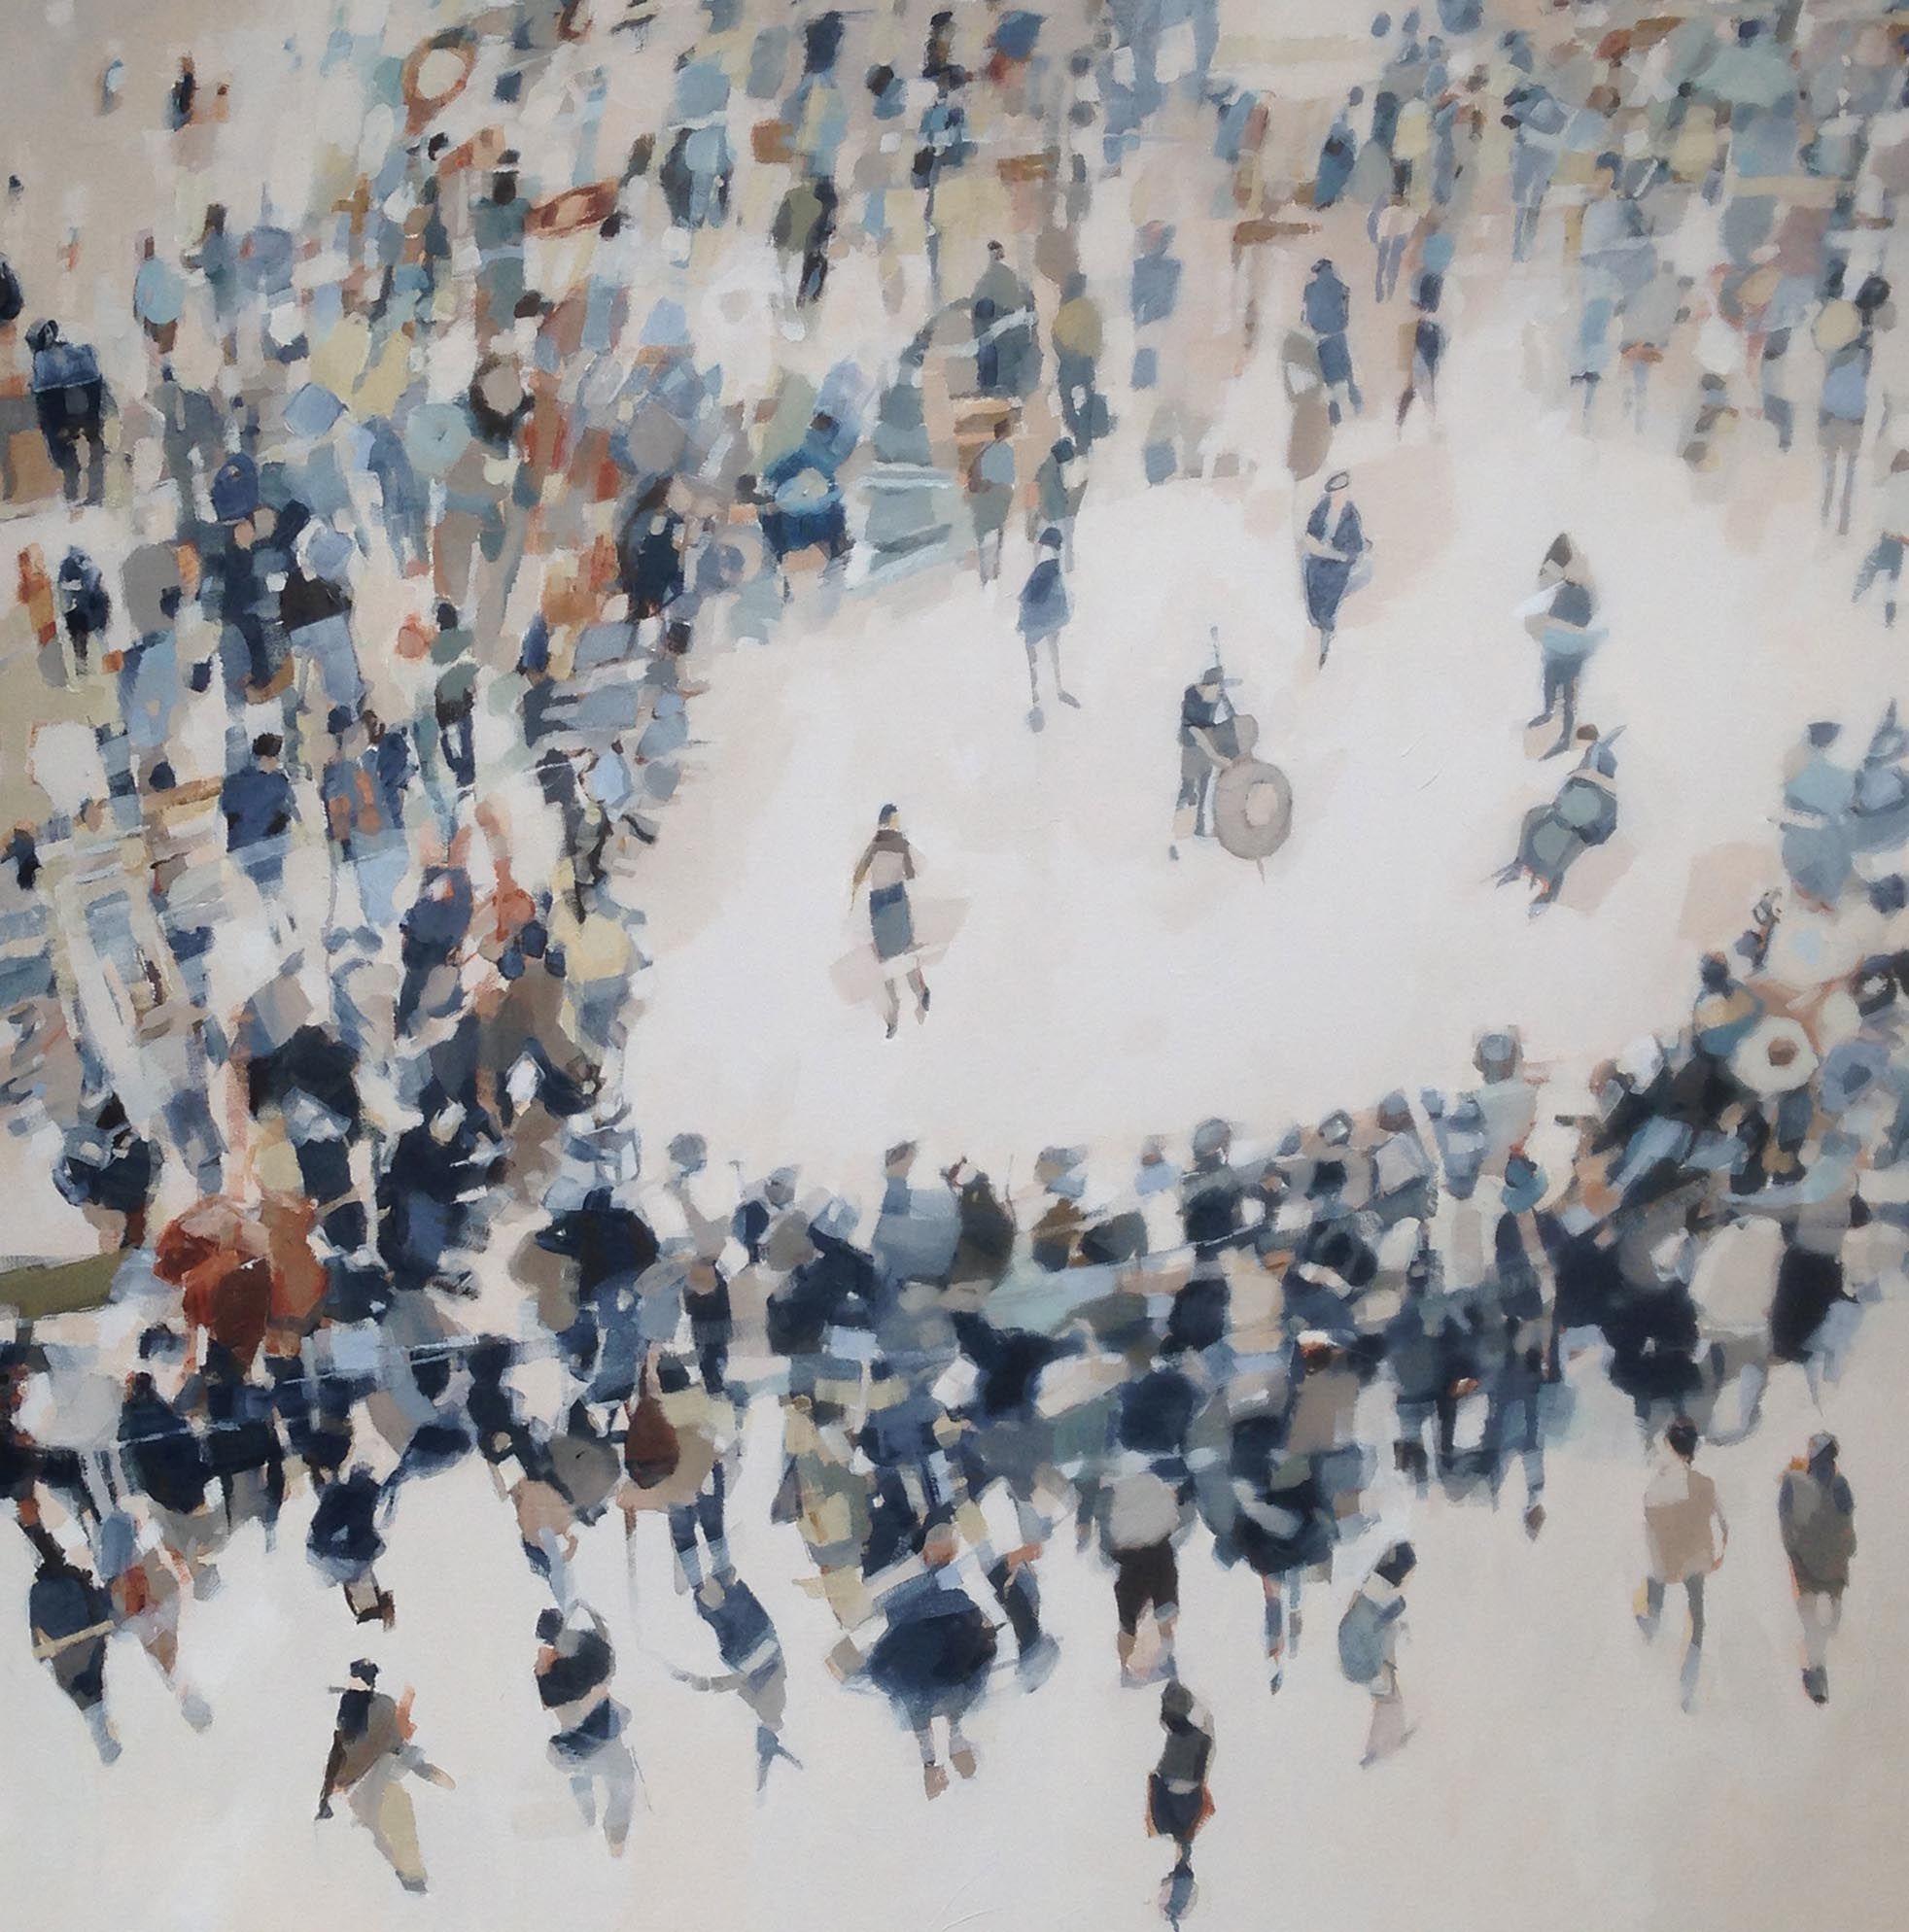 Caroline Yates An Audience Oil on canvas © Artist